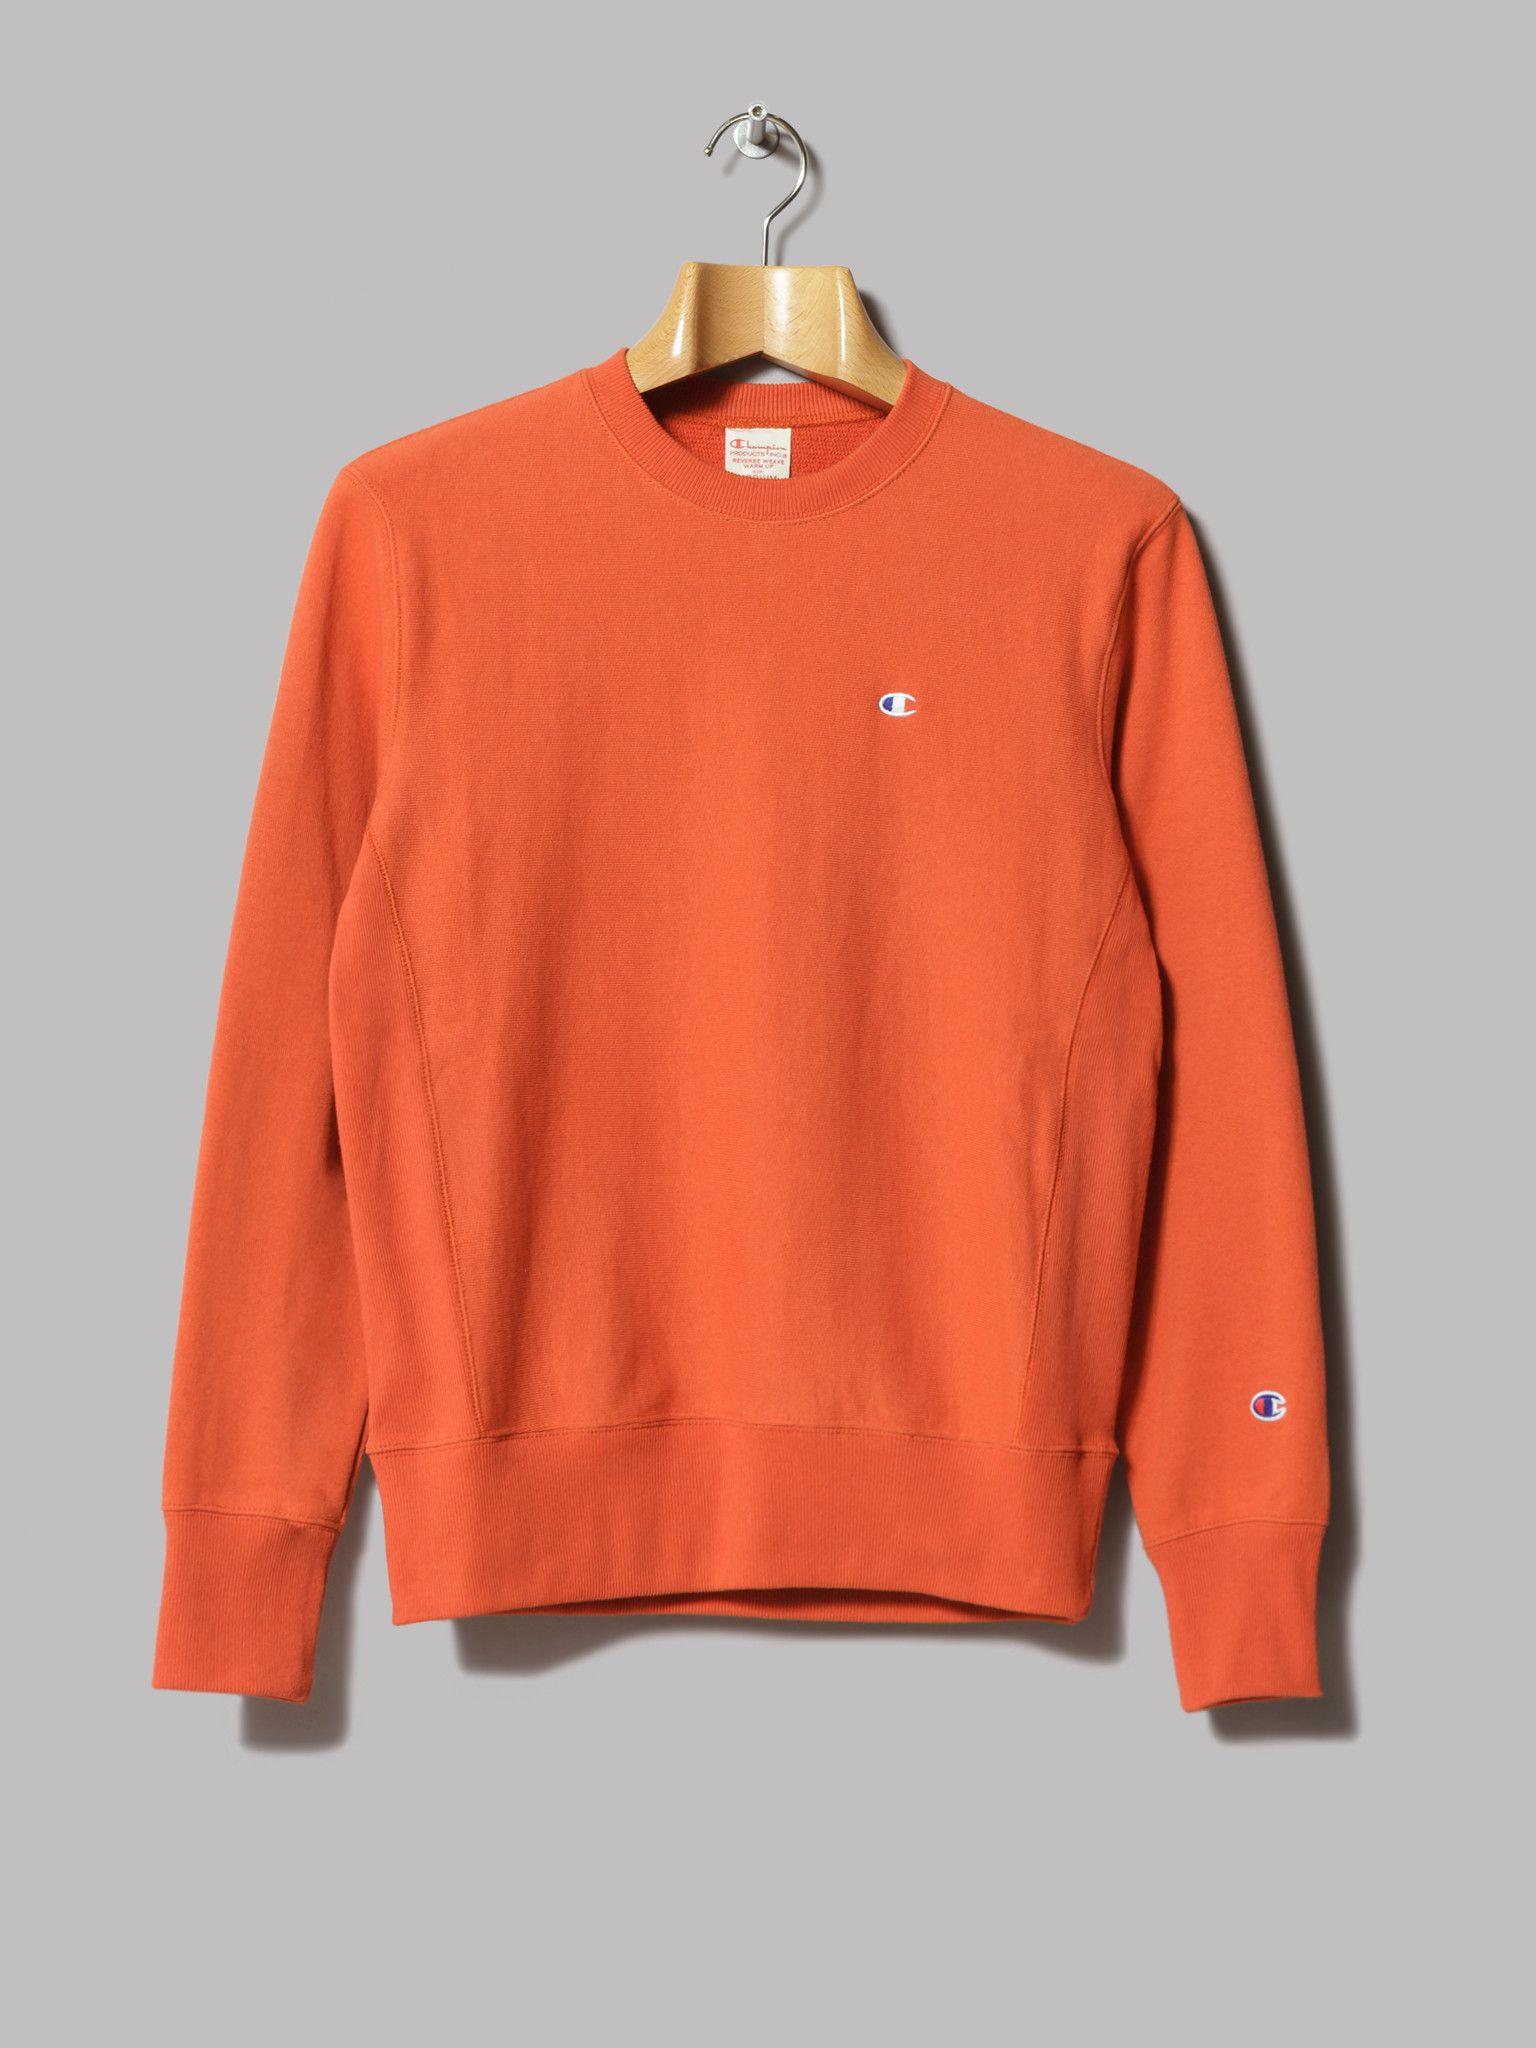 Champion Reverse Weave Crewneck Sweatshirt (Orange)   Fleece ...